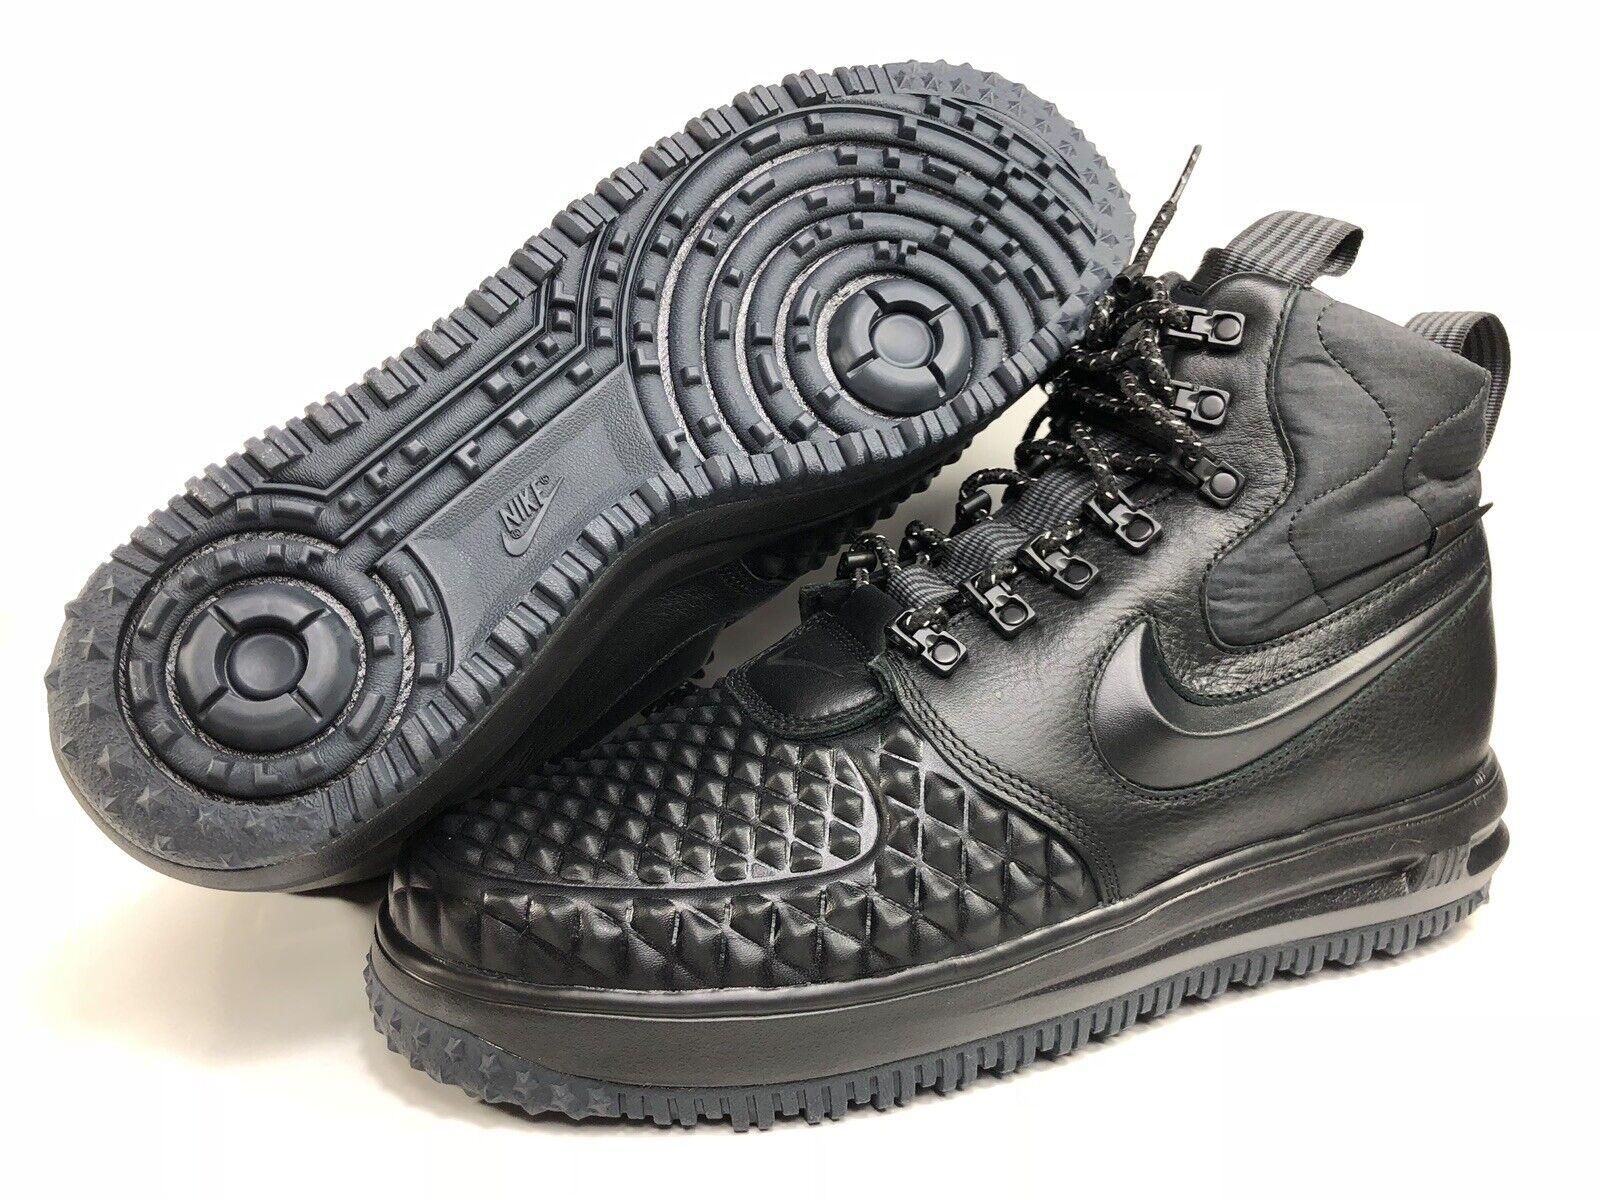 Nike Lunar Air Force 1 Mens Duckboot '17 Triple Black 916682 002 NEW Size 10